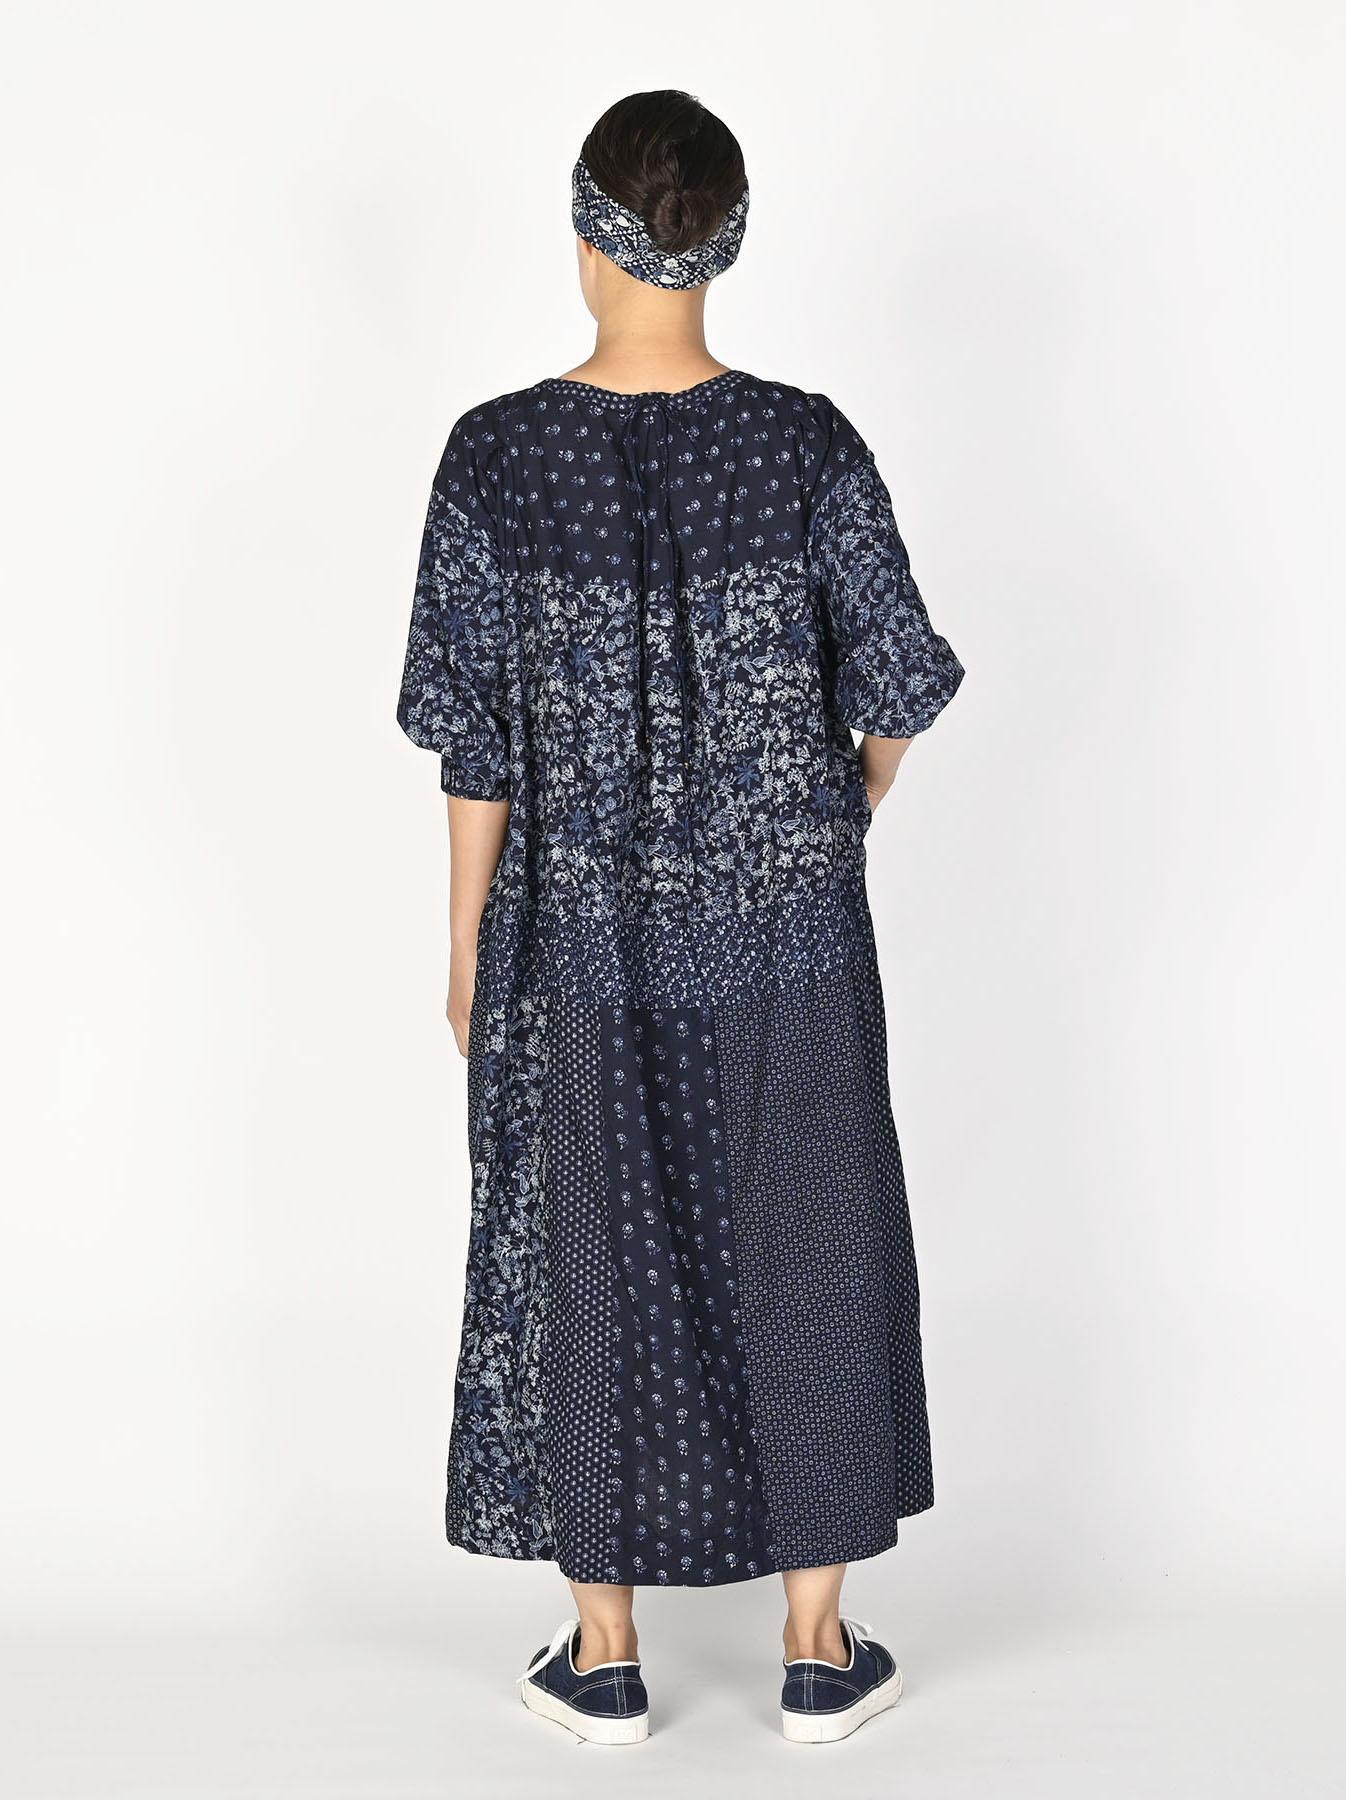 Indigo Tappet Flower Patchwork Dress-4